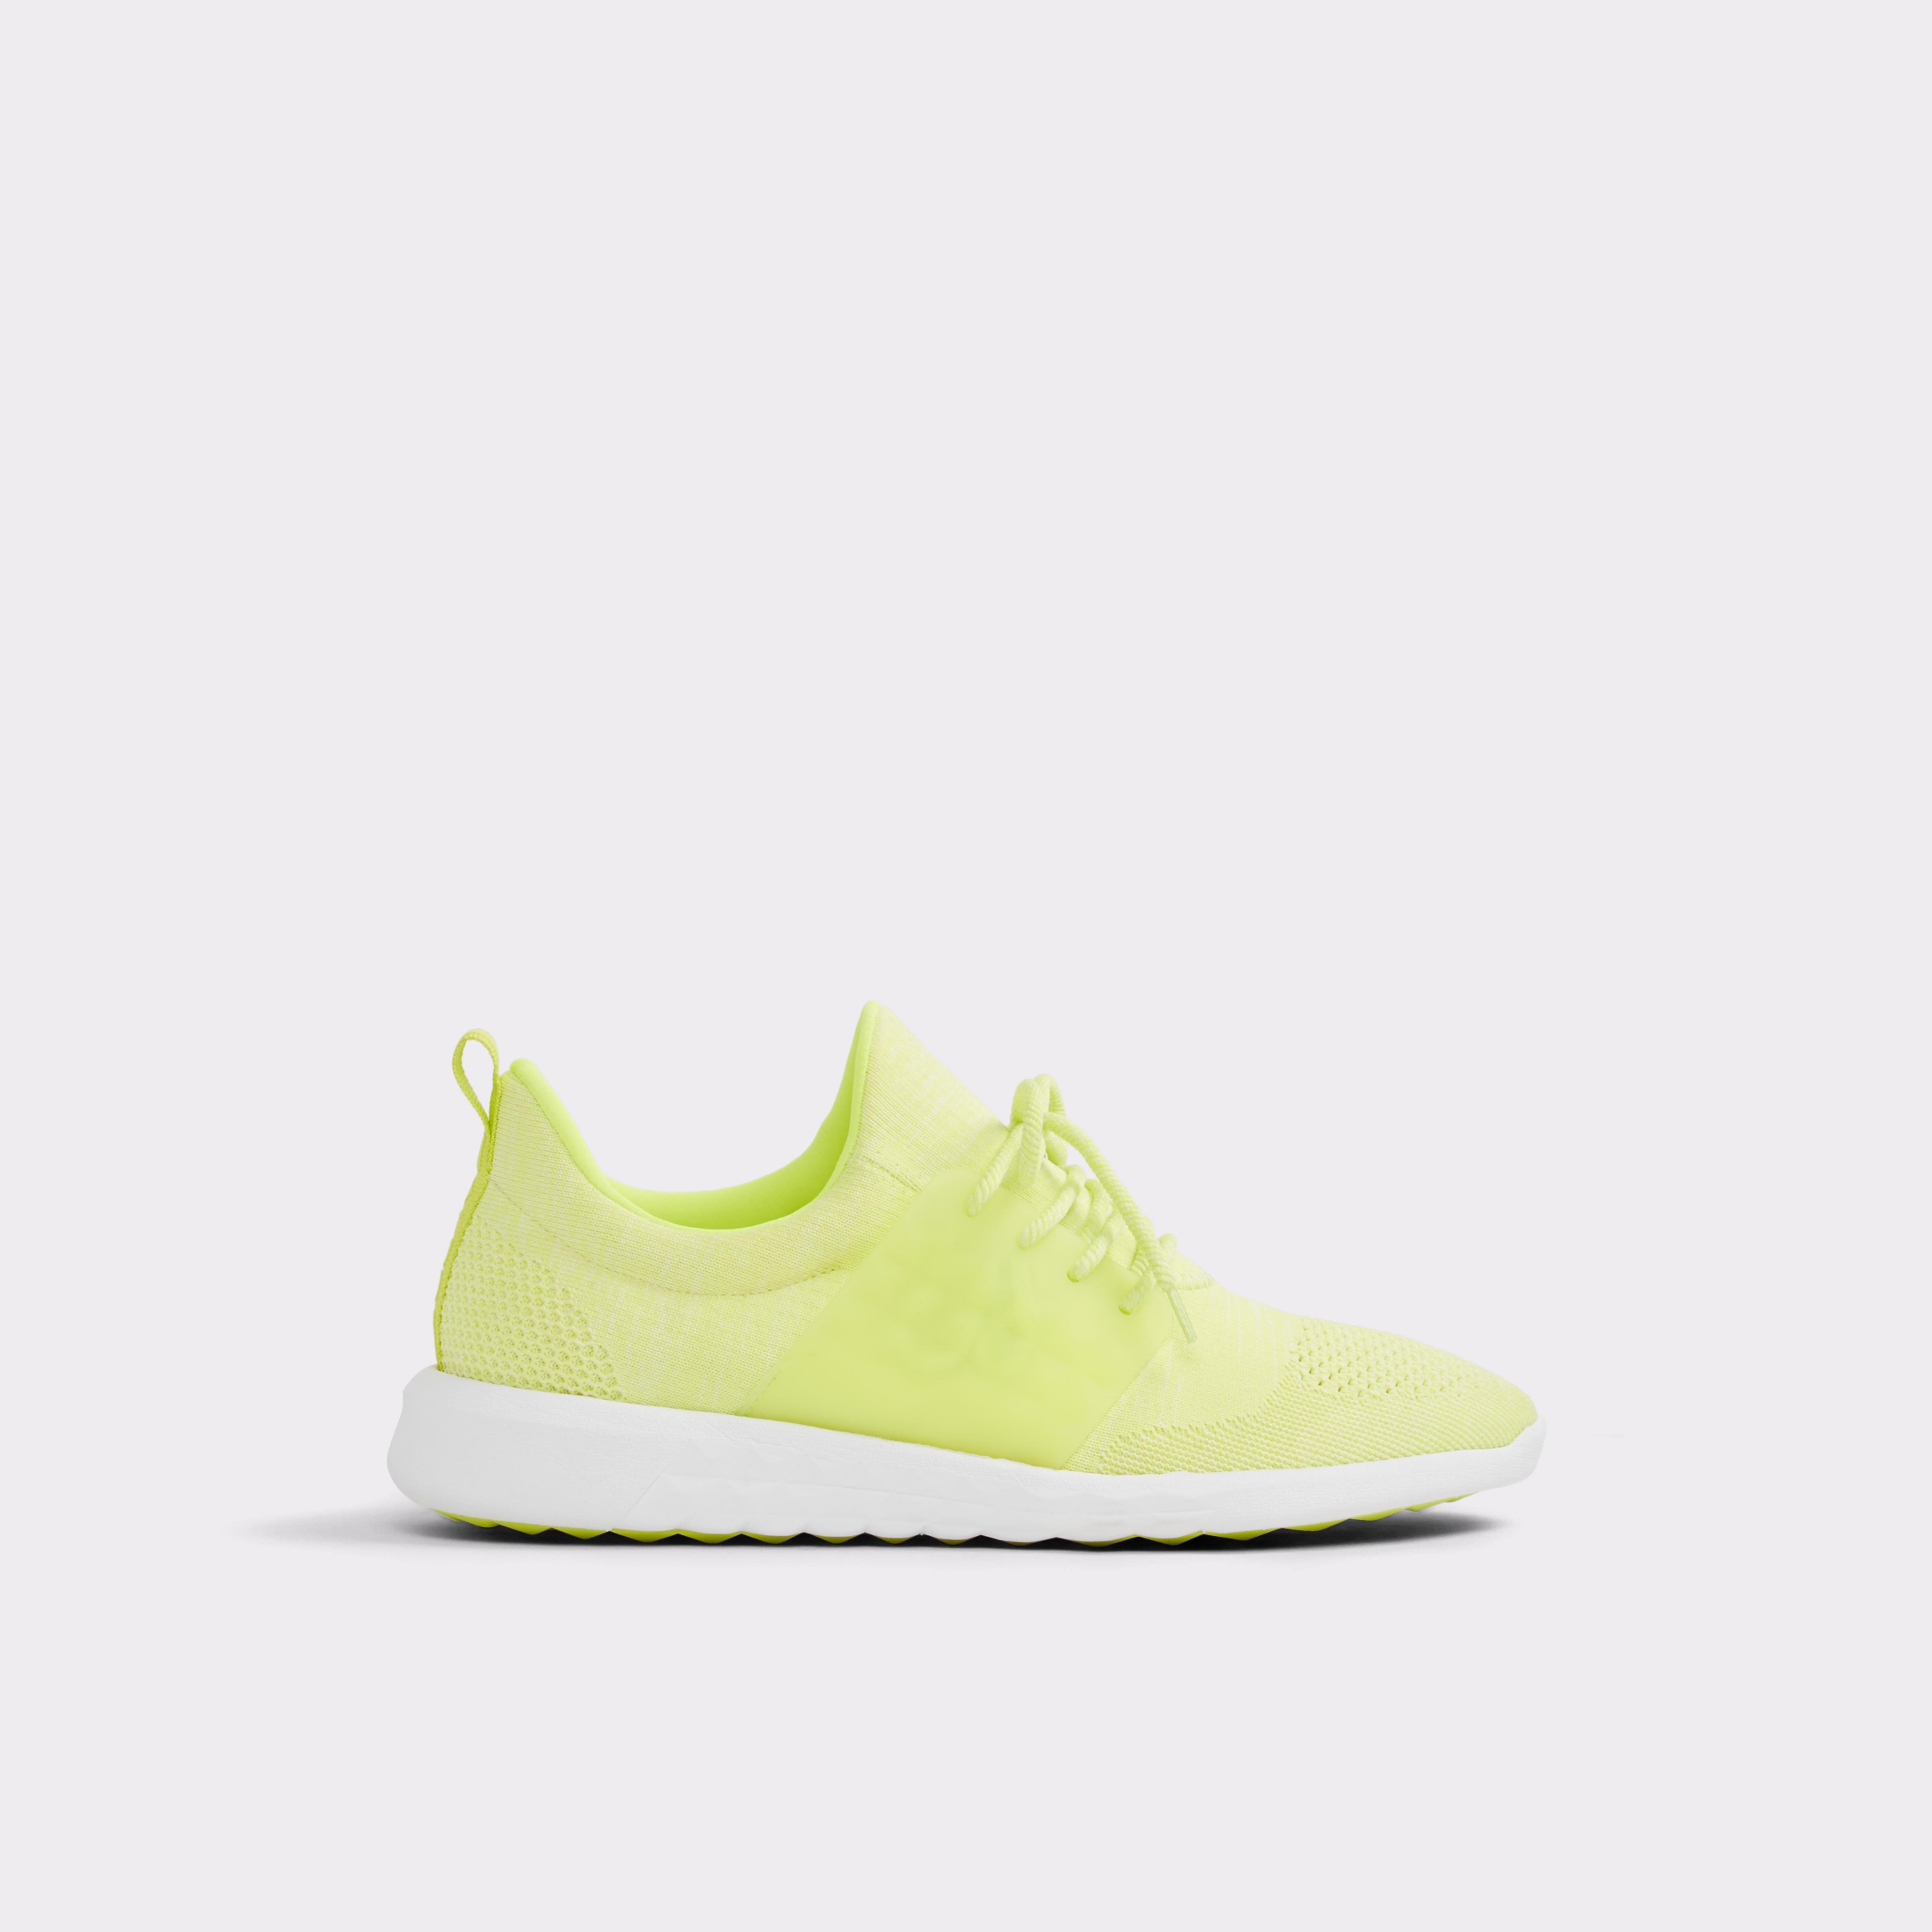 Buy Cheap Eastbay Shopping Online Outlet Sale ALDO MX.0 Sneaker(Men's) -Black Leather Textile Buy Cheap Supply OTEMB